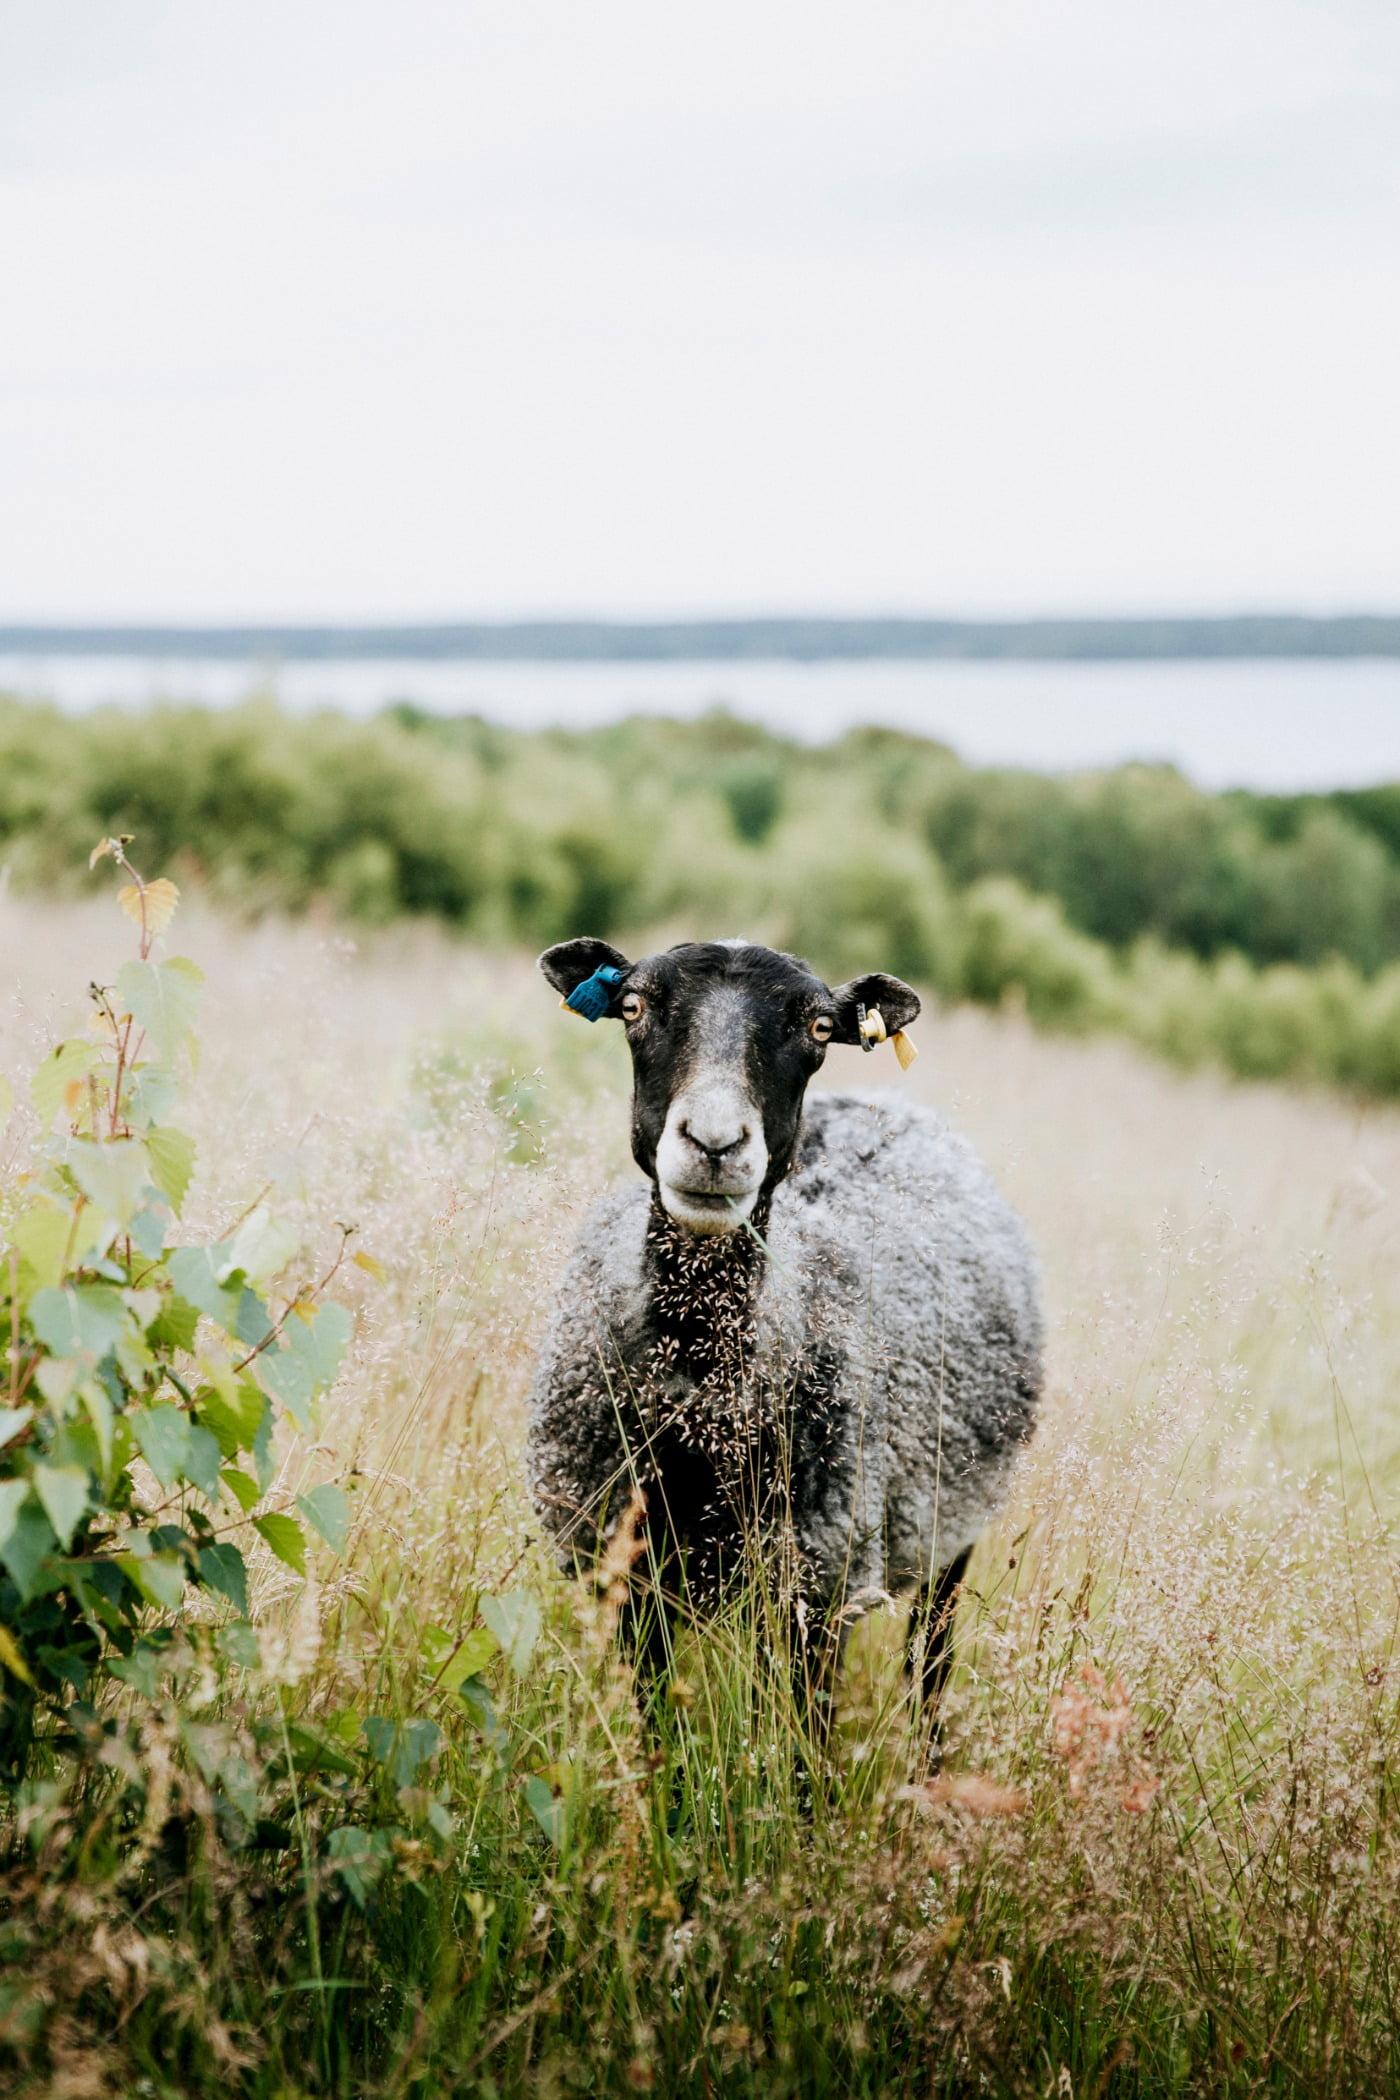 Working animal, Natural landscape, Sky, Plant, Grass